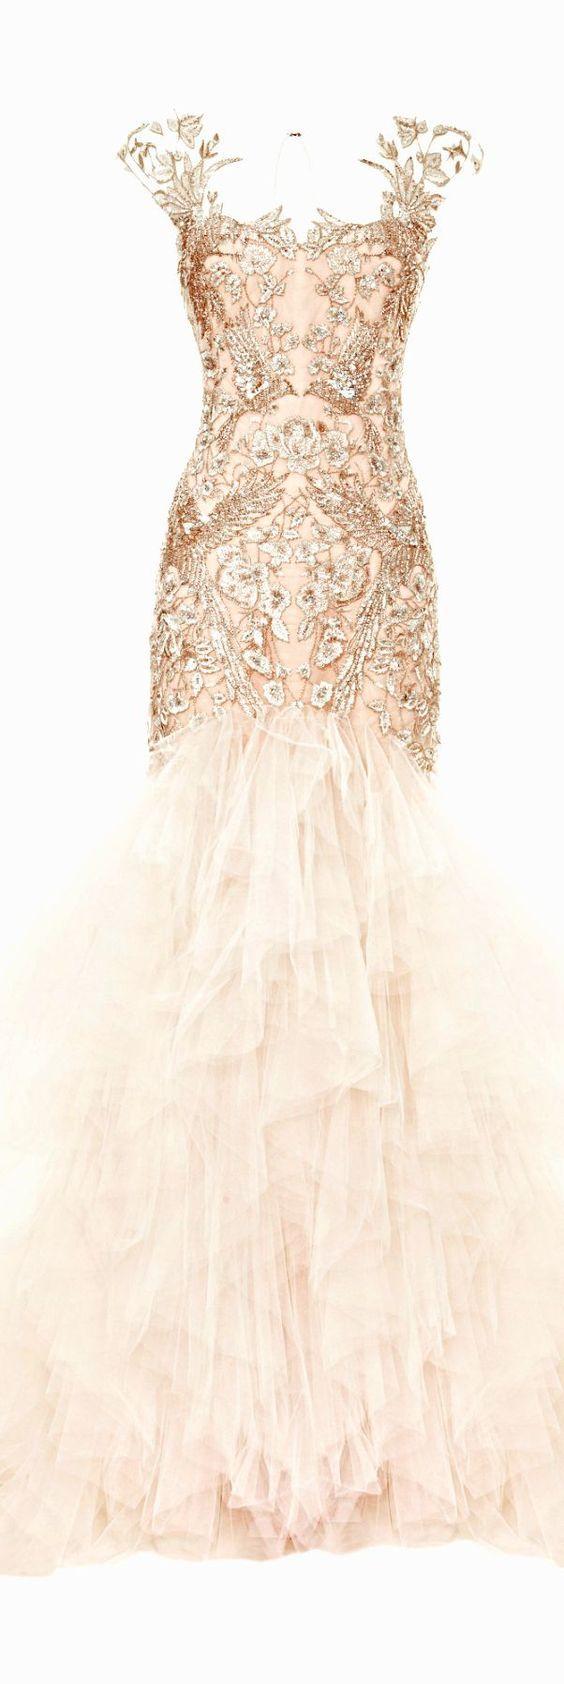 Stunning embellished wedding gown himisspuffrose